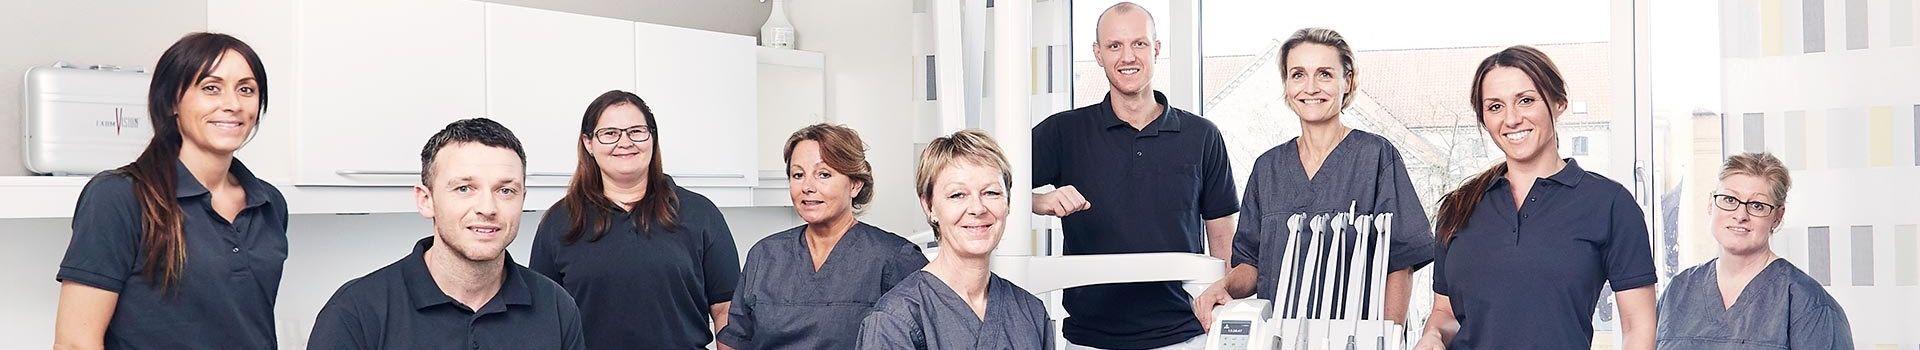 akut tandlæge århus